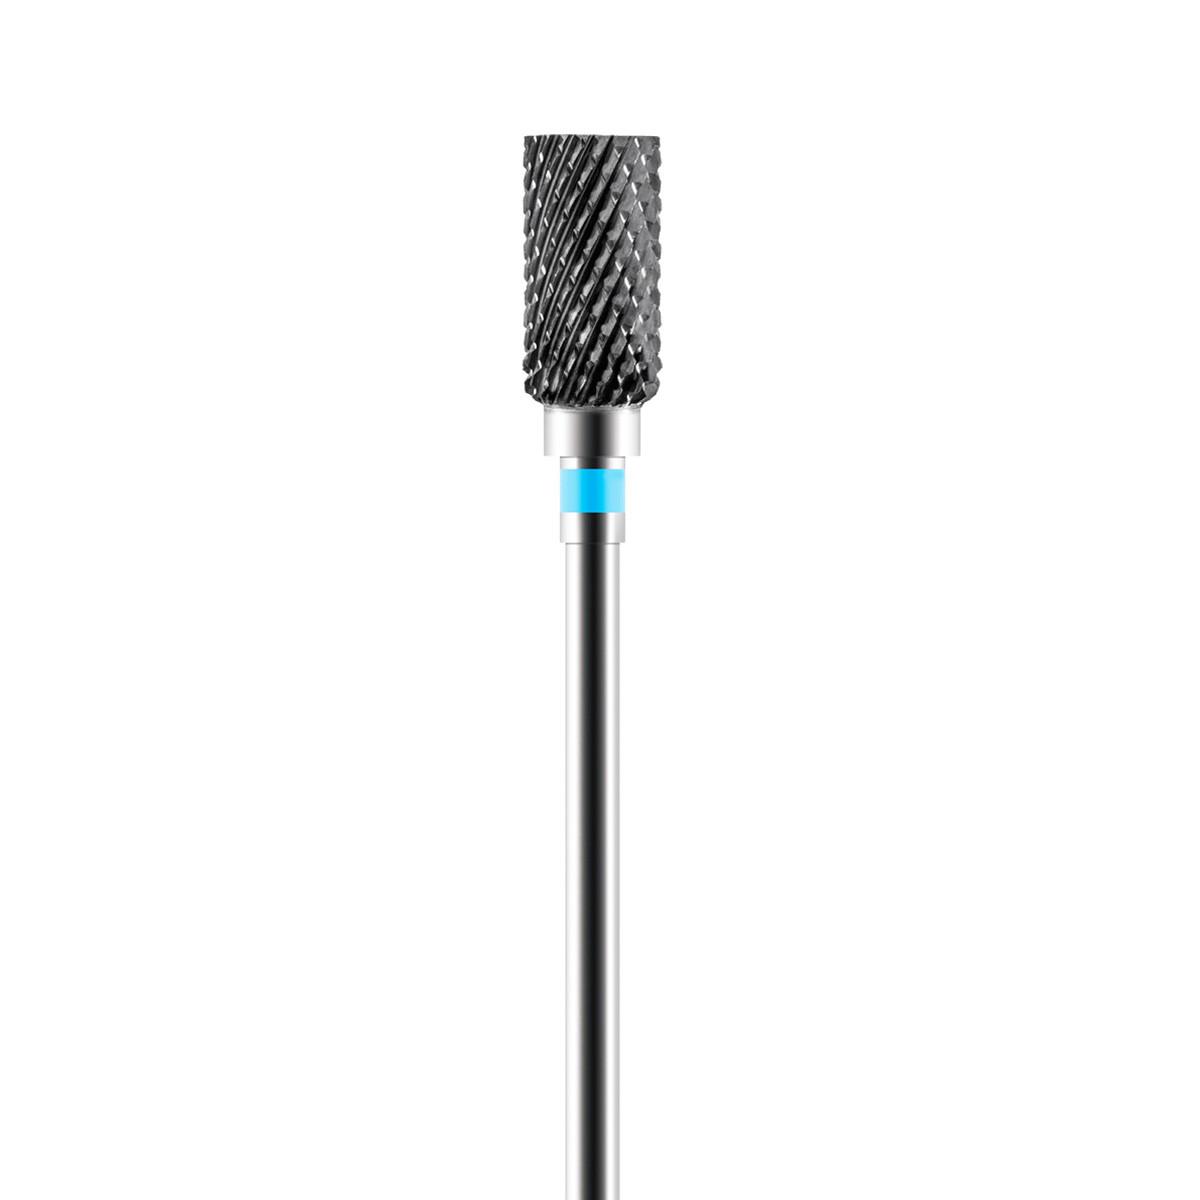 Broca Tungstênio Maxicut American Burrs Azul - 6510.060HP - Corte Cruzado Médio